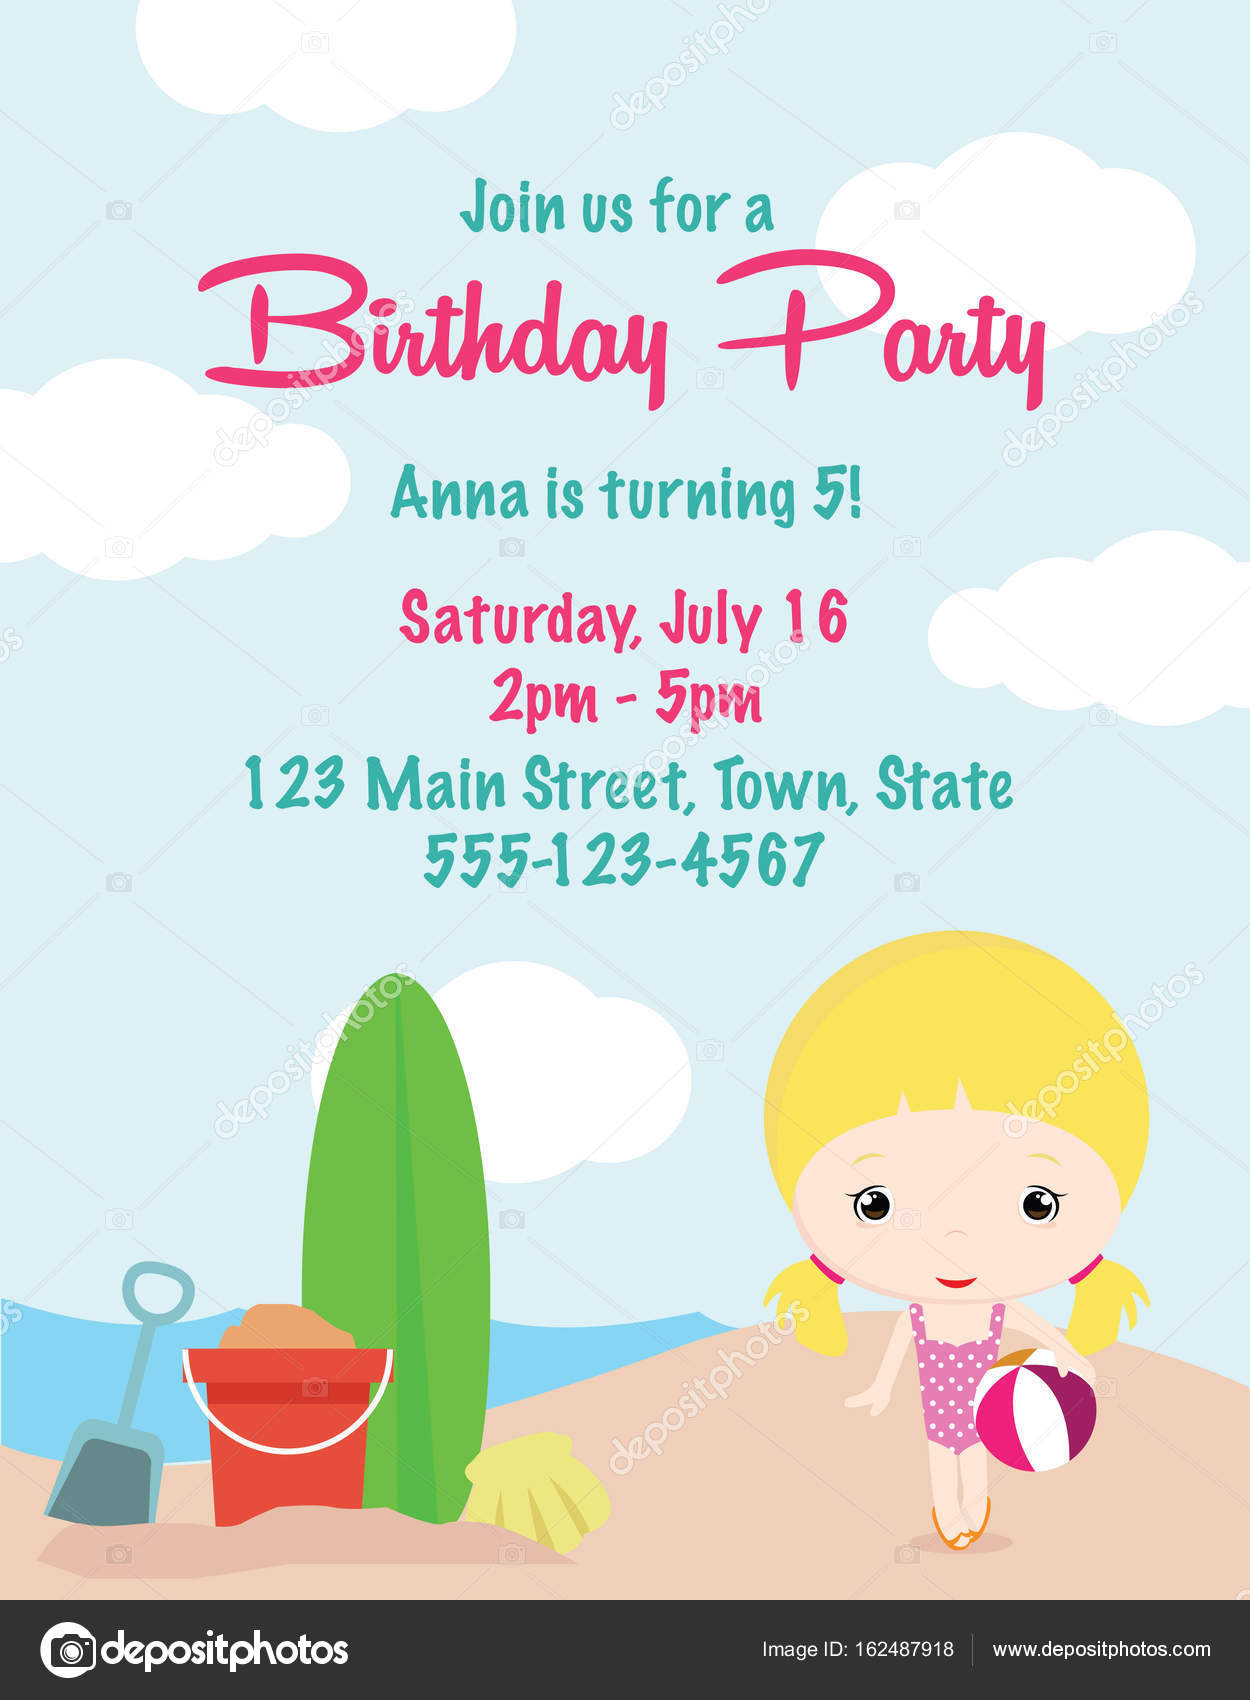 Cute cartoon girl birthday invitation card stock vector cute cartoon girl birthday invitation card stock vector filmwisefo